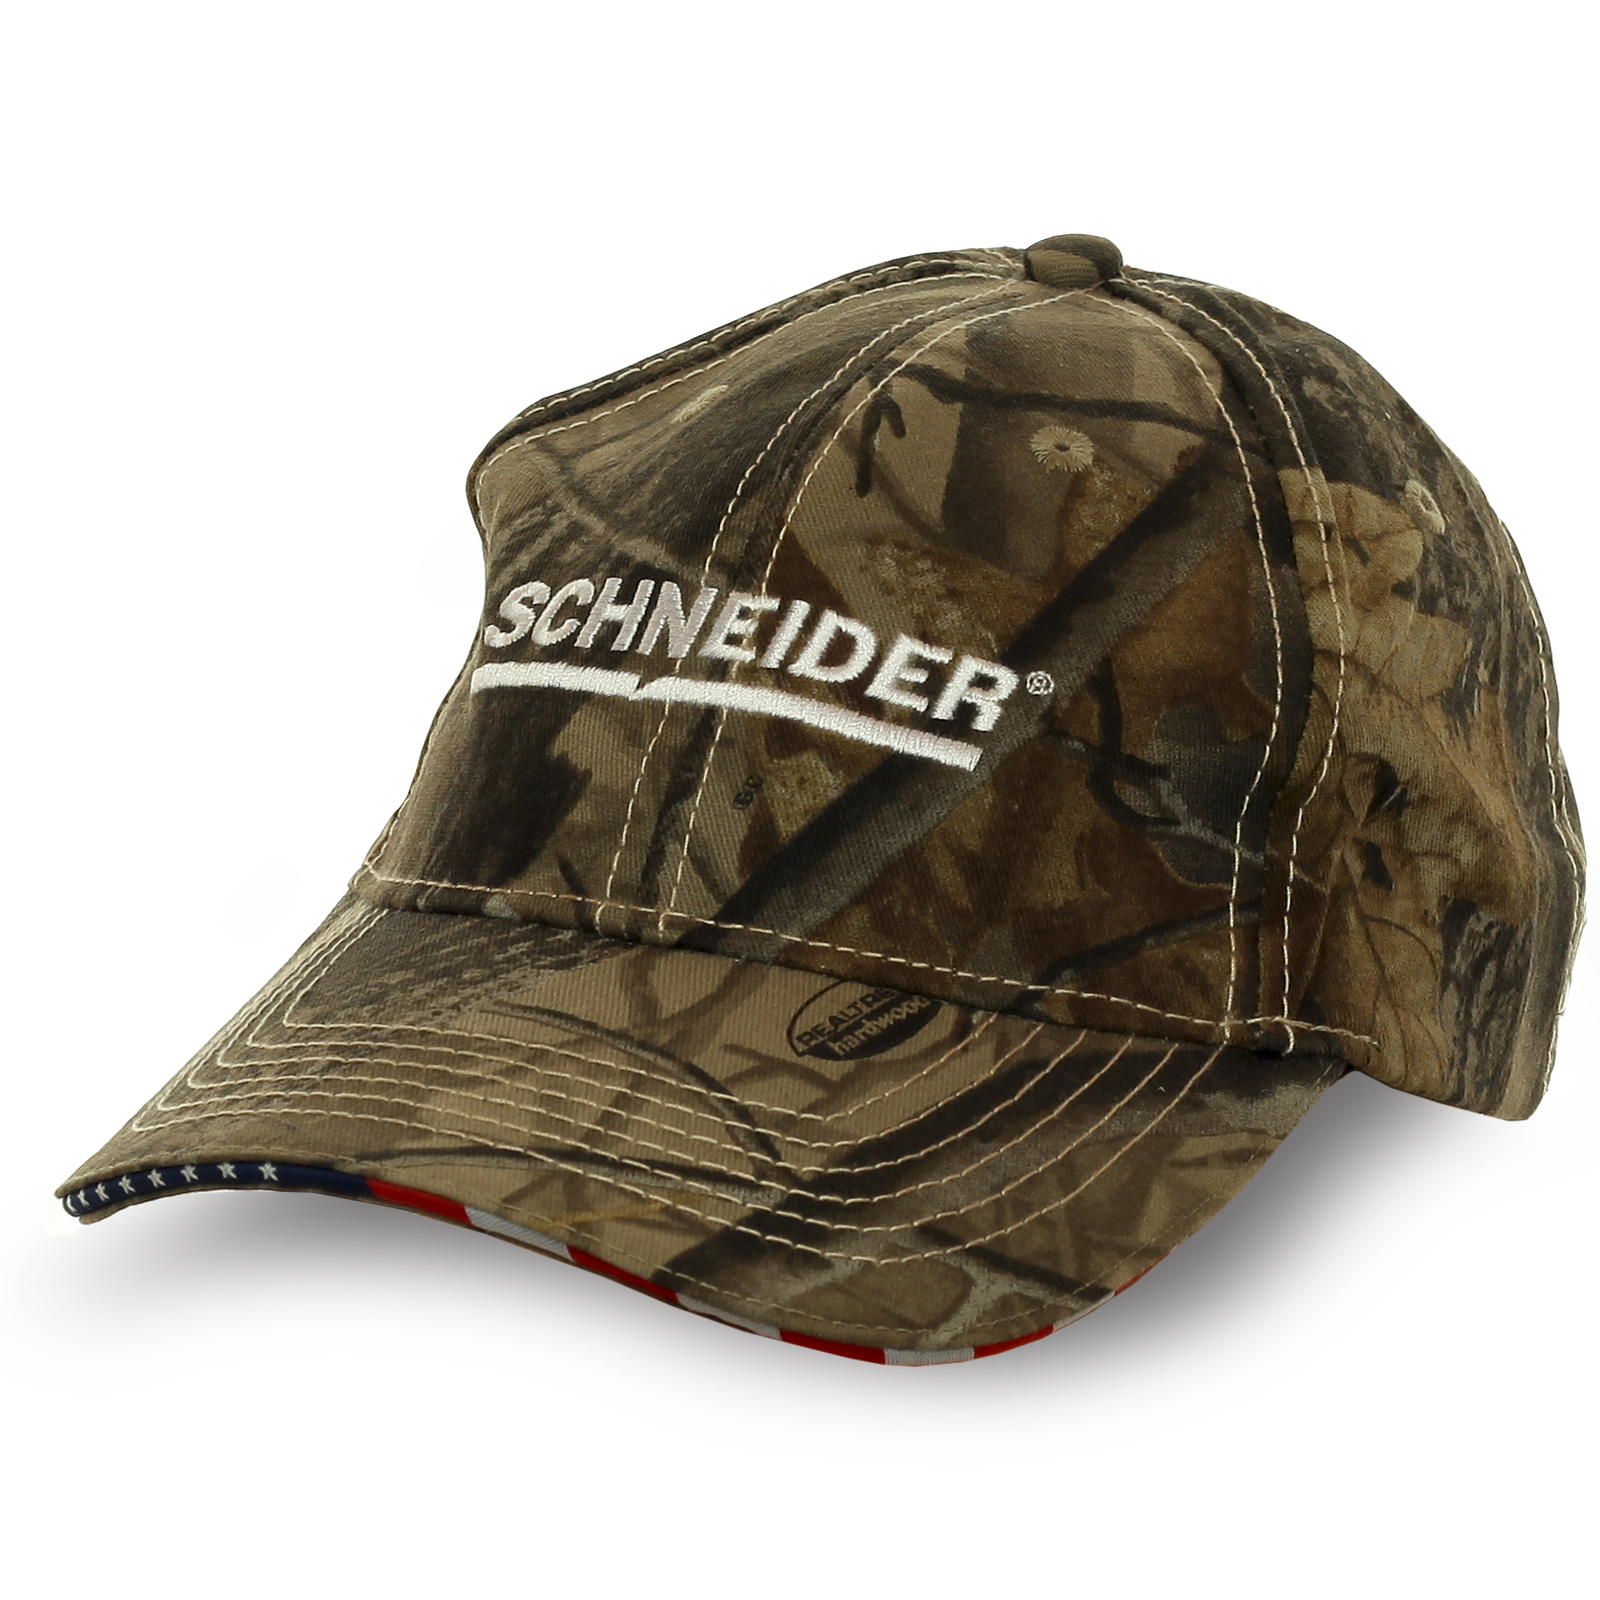 Стильная бейсболка Schneider